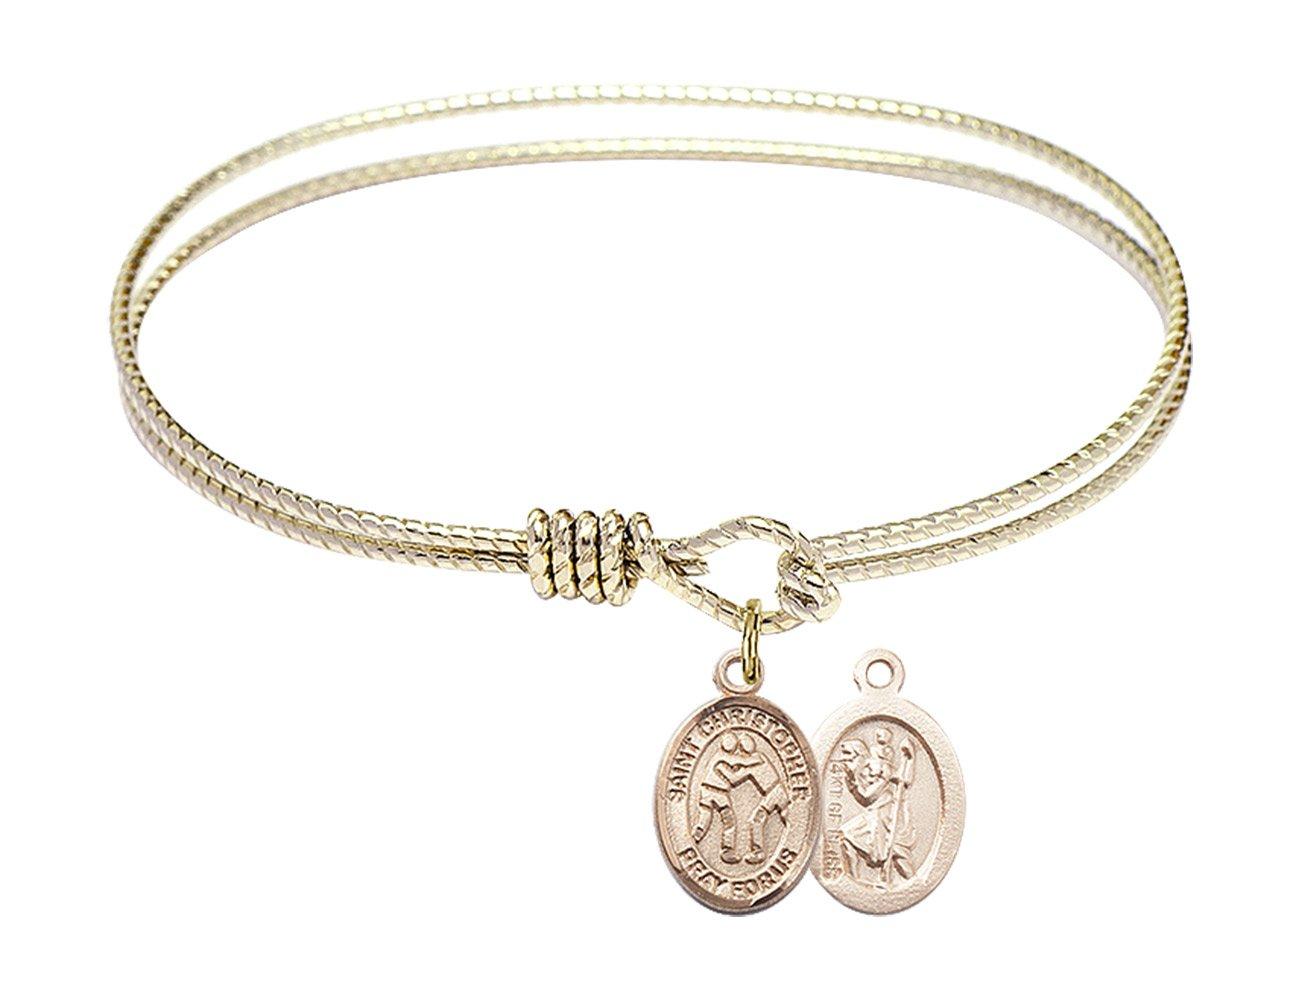 6 1/4 inch Oval Eye Hook Bangle Bracelet with a St. Christopher/Wrestling charm.